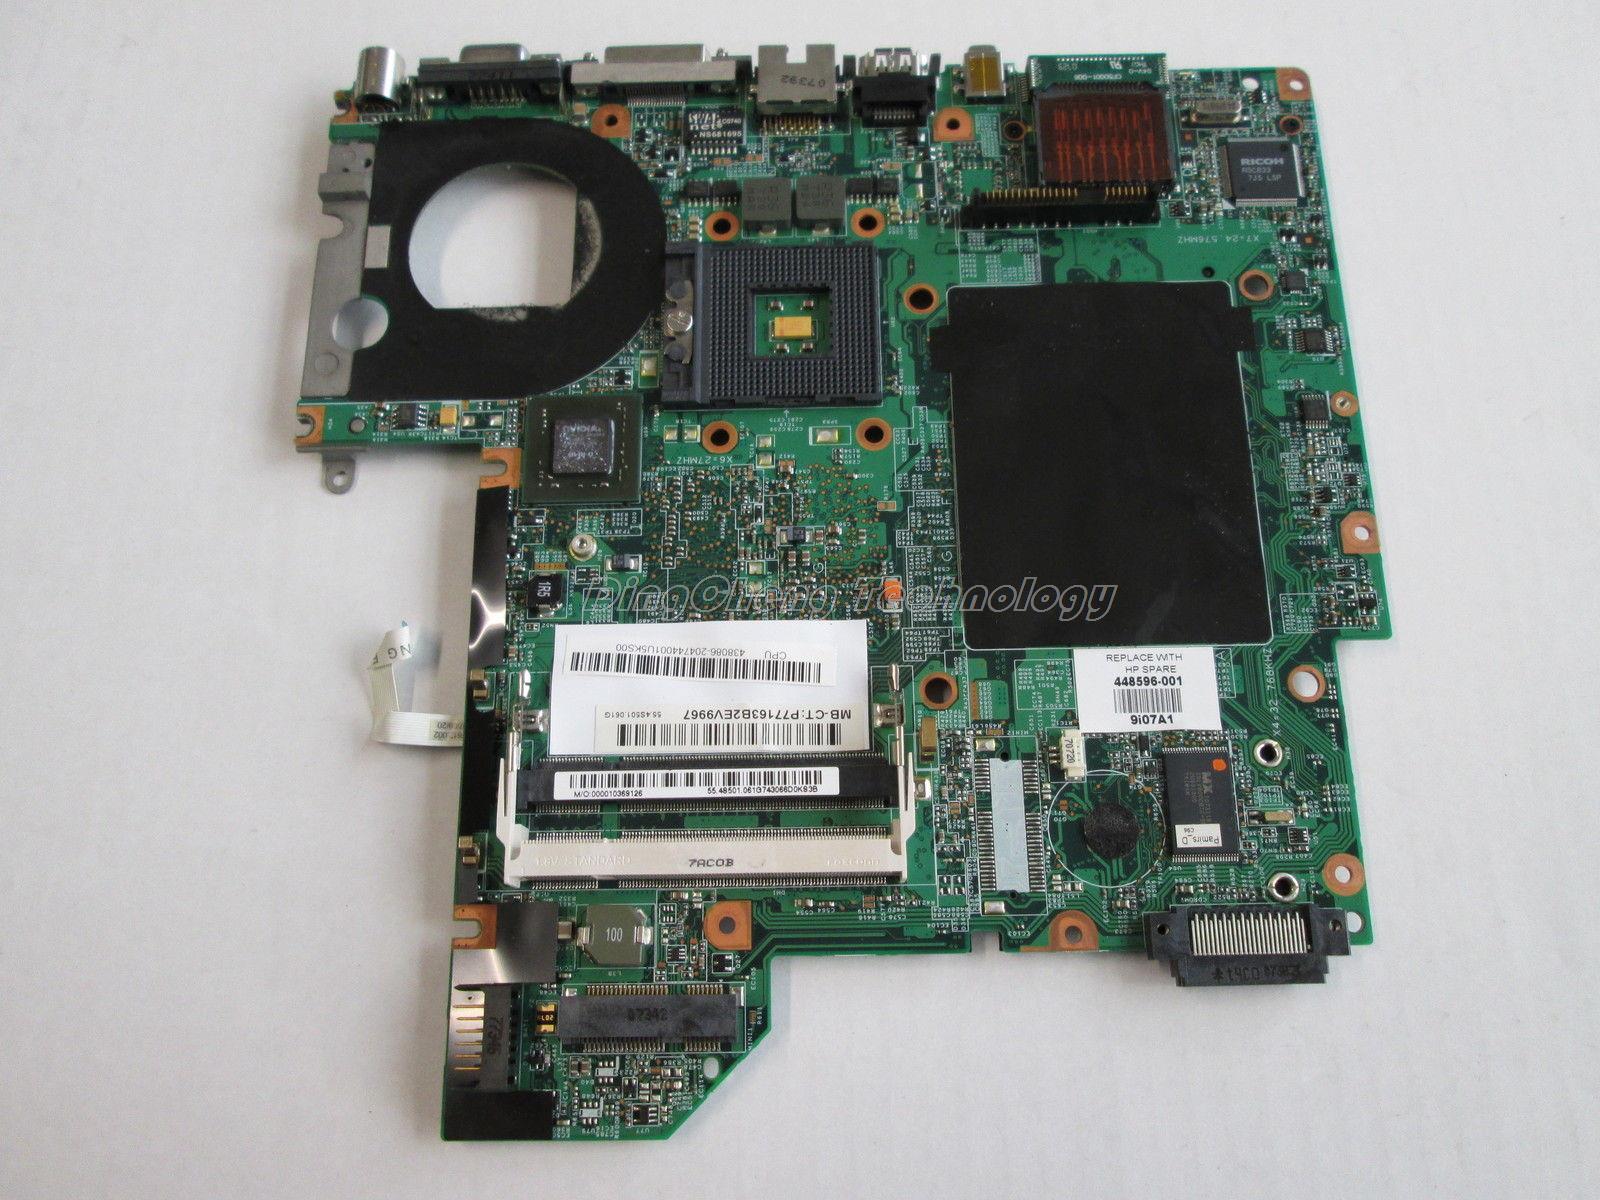 HP PAVILION DV2000 VIDEO CARD DRIVER FOR WINDOWS 7